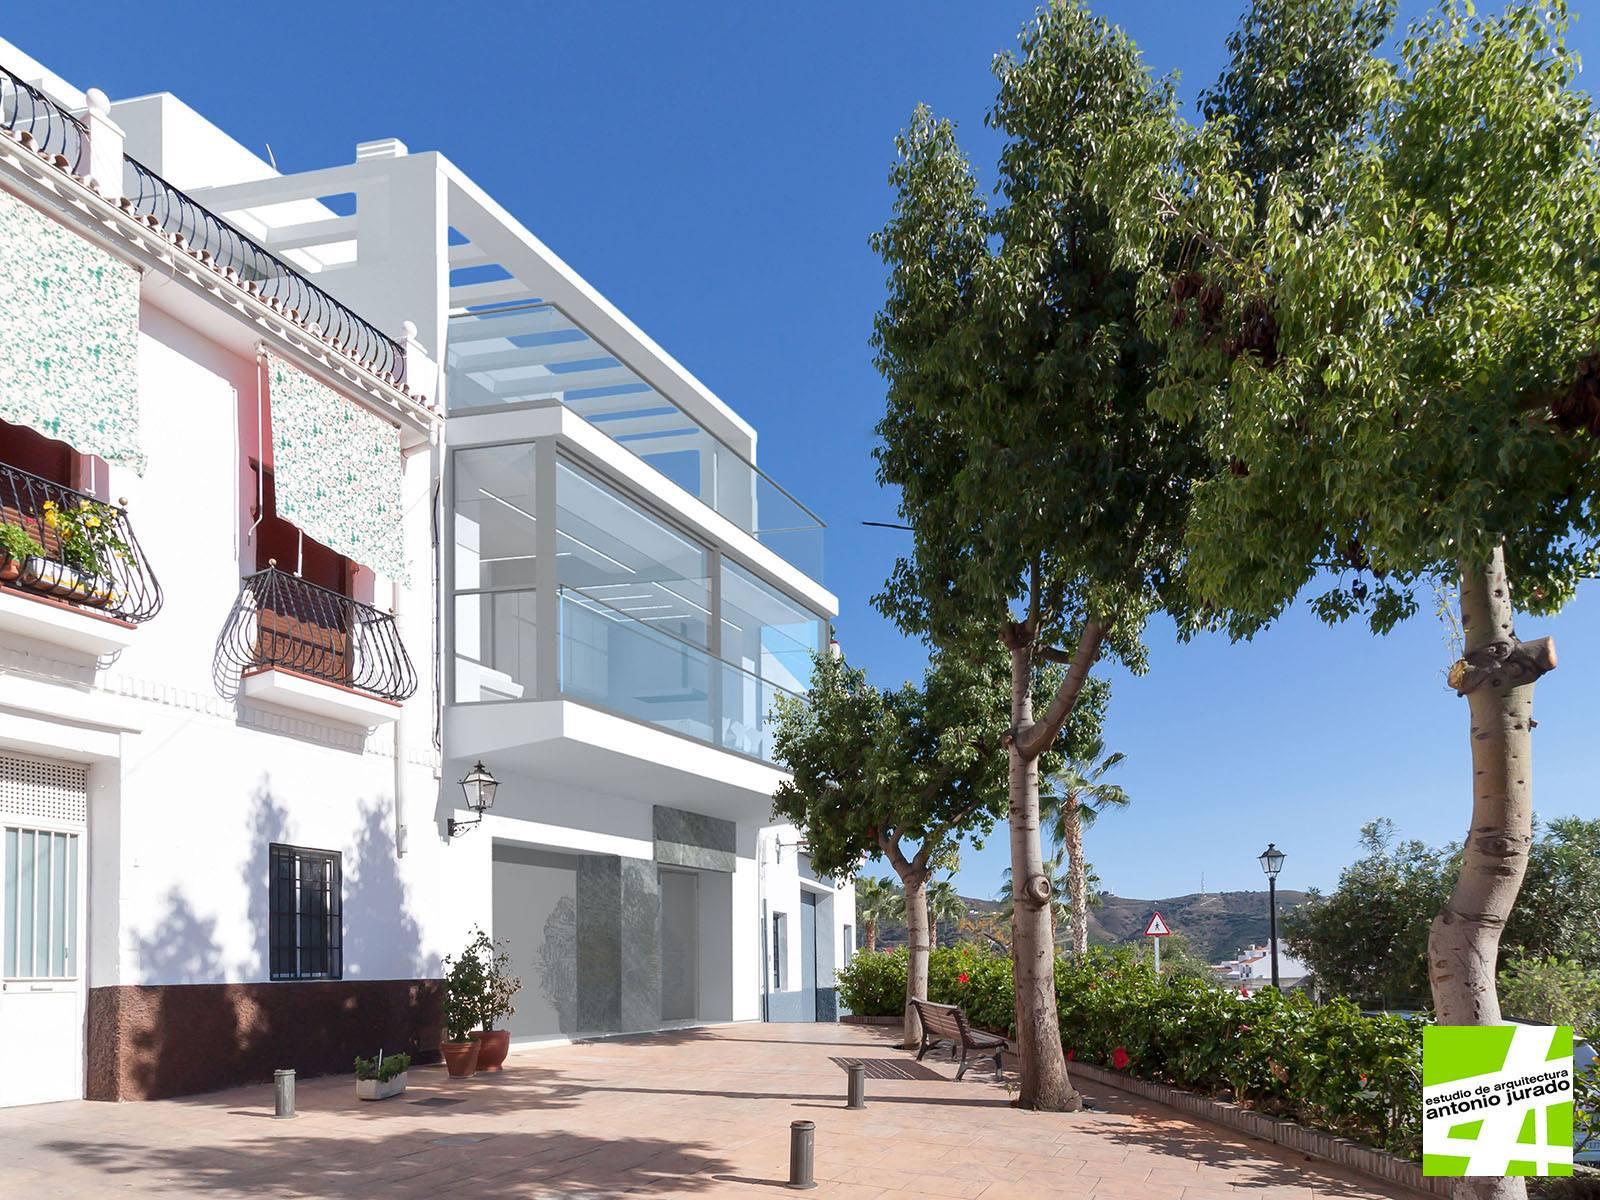 irene-sanchez-moreno-eldevenir-art-gallery-galeria-arte-online-torrox-malaga-contemporaneo-antonio-jurado-arquitectura (2).jpg